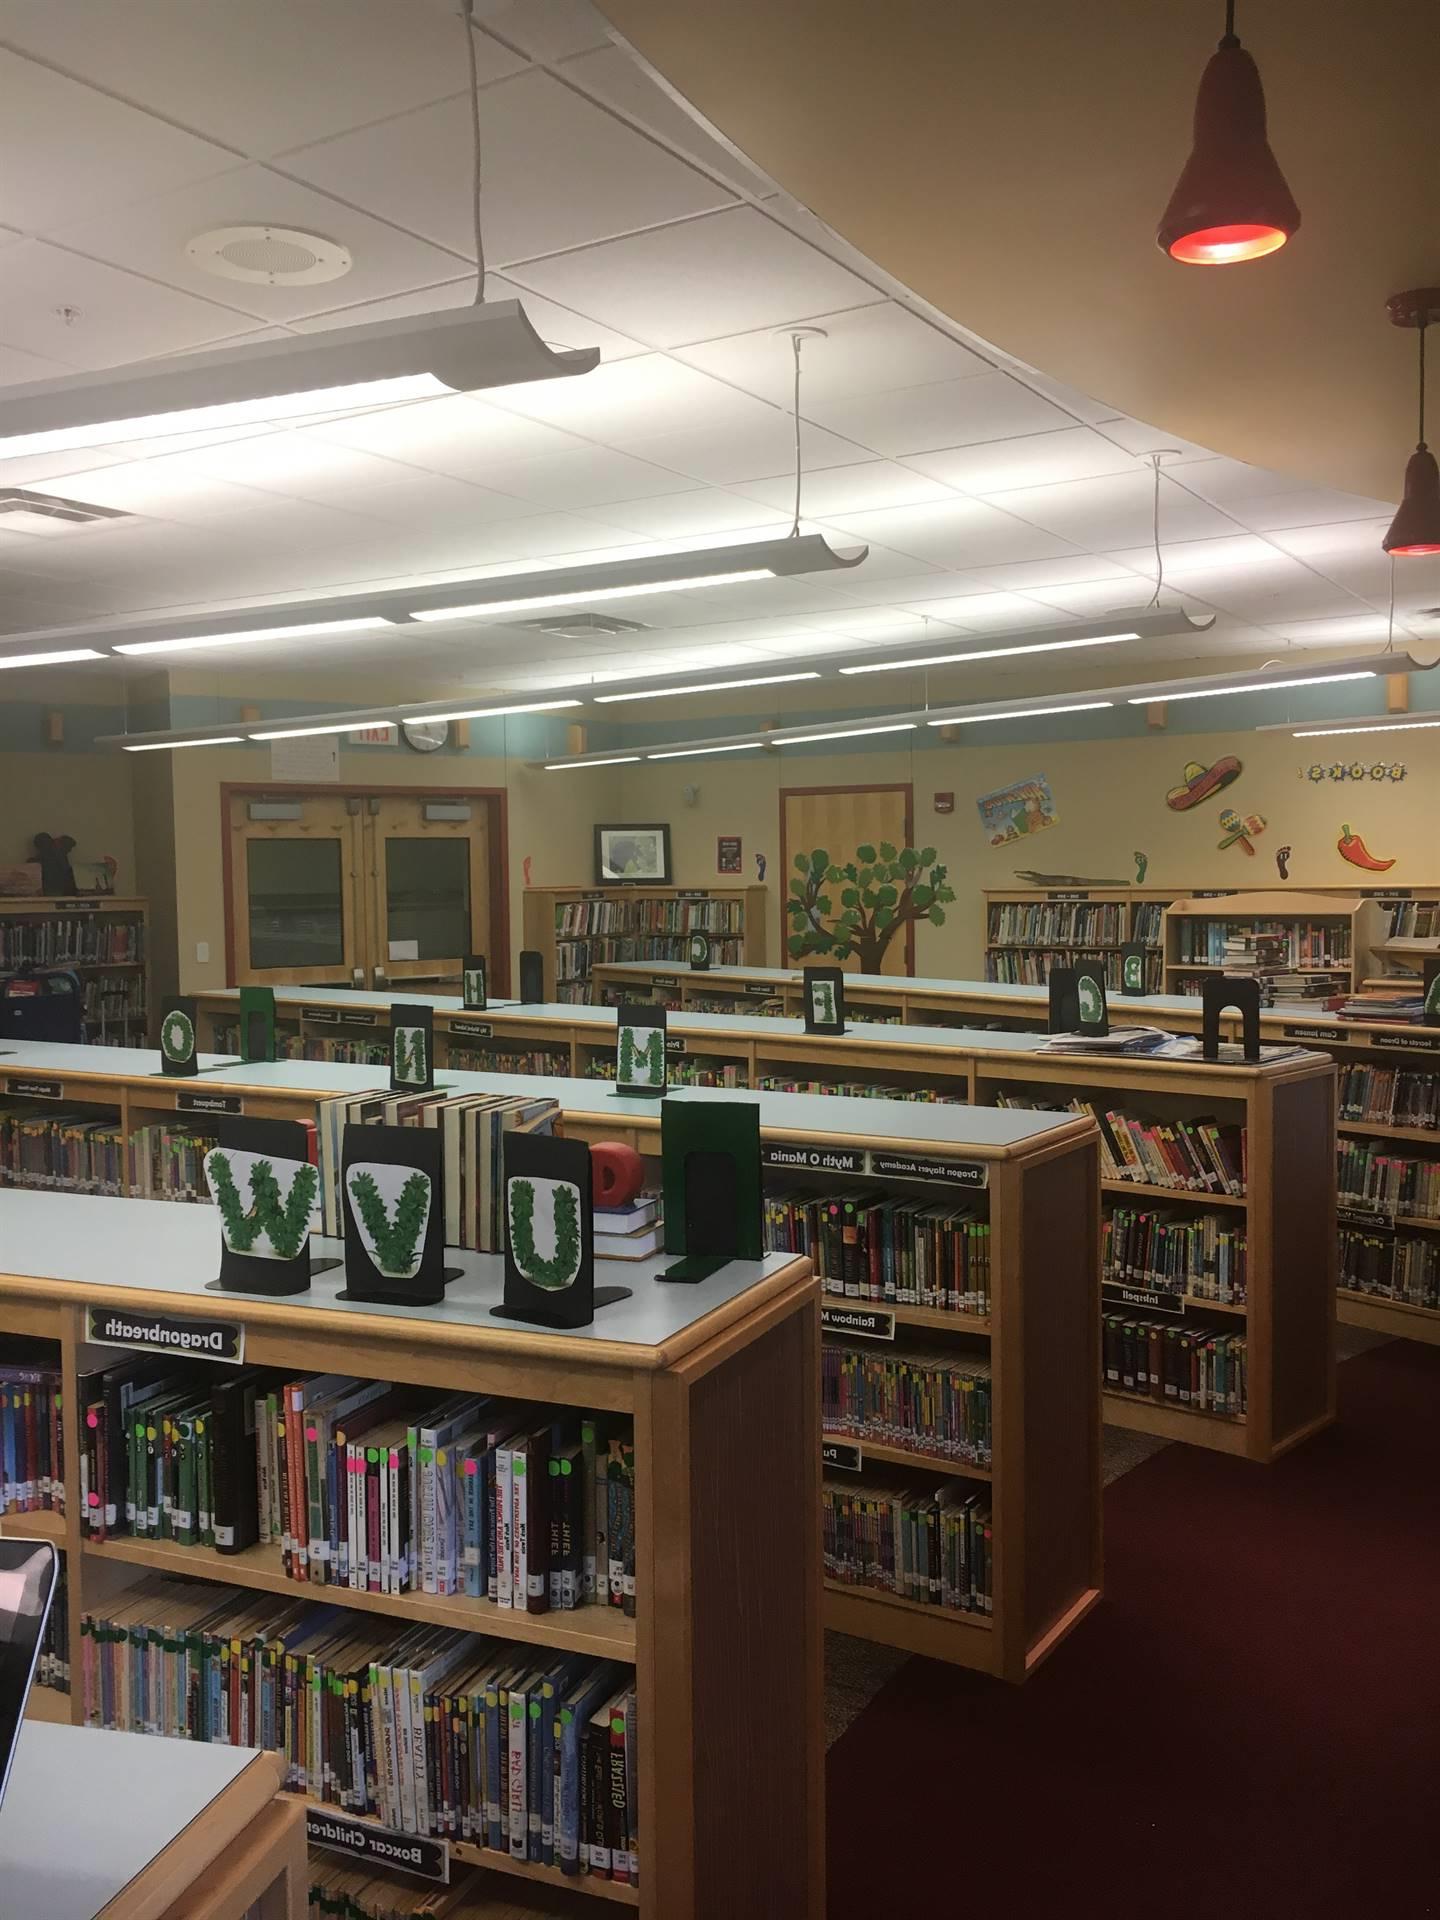 Highcliff Elementary Library